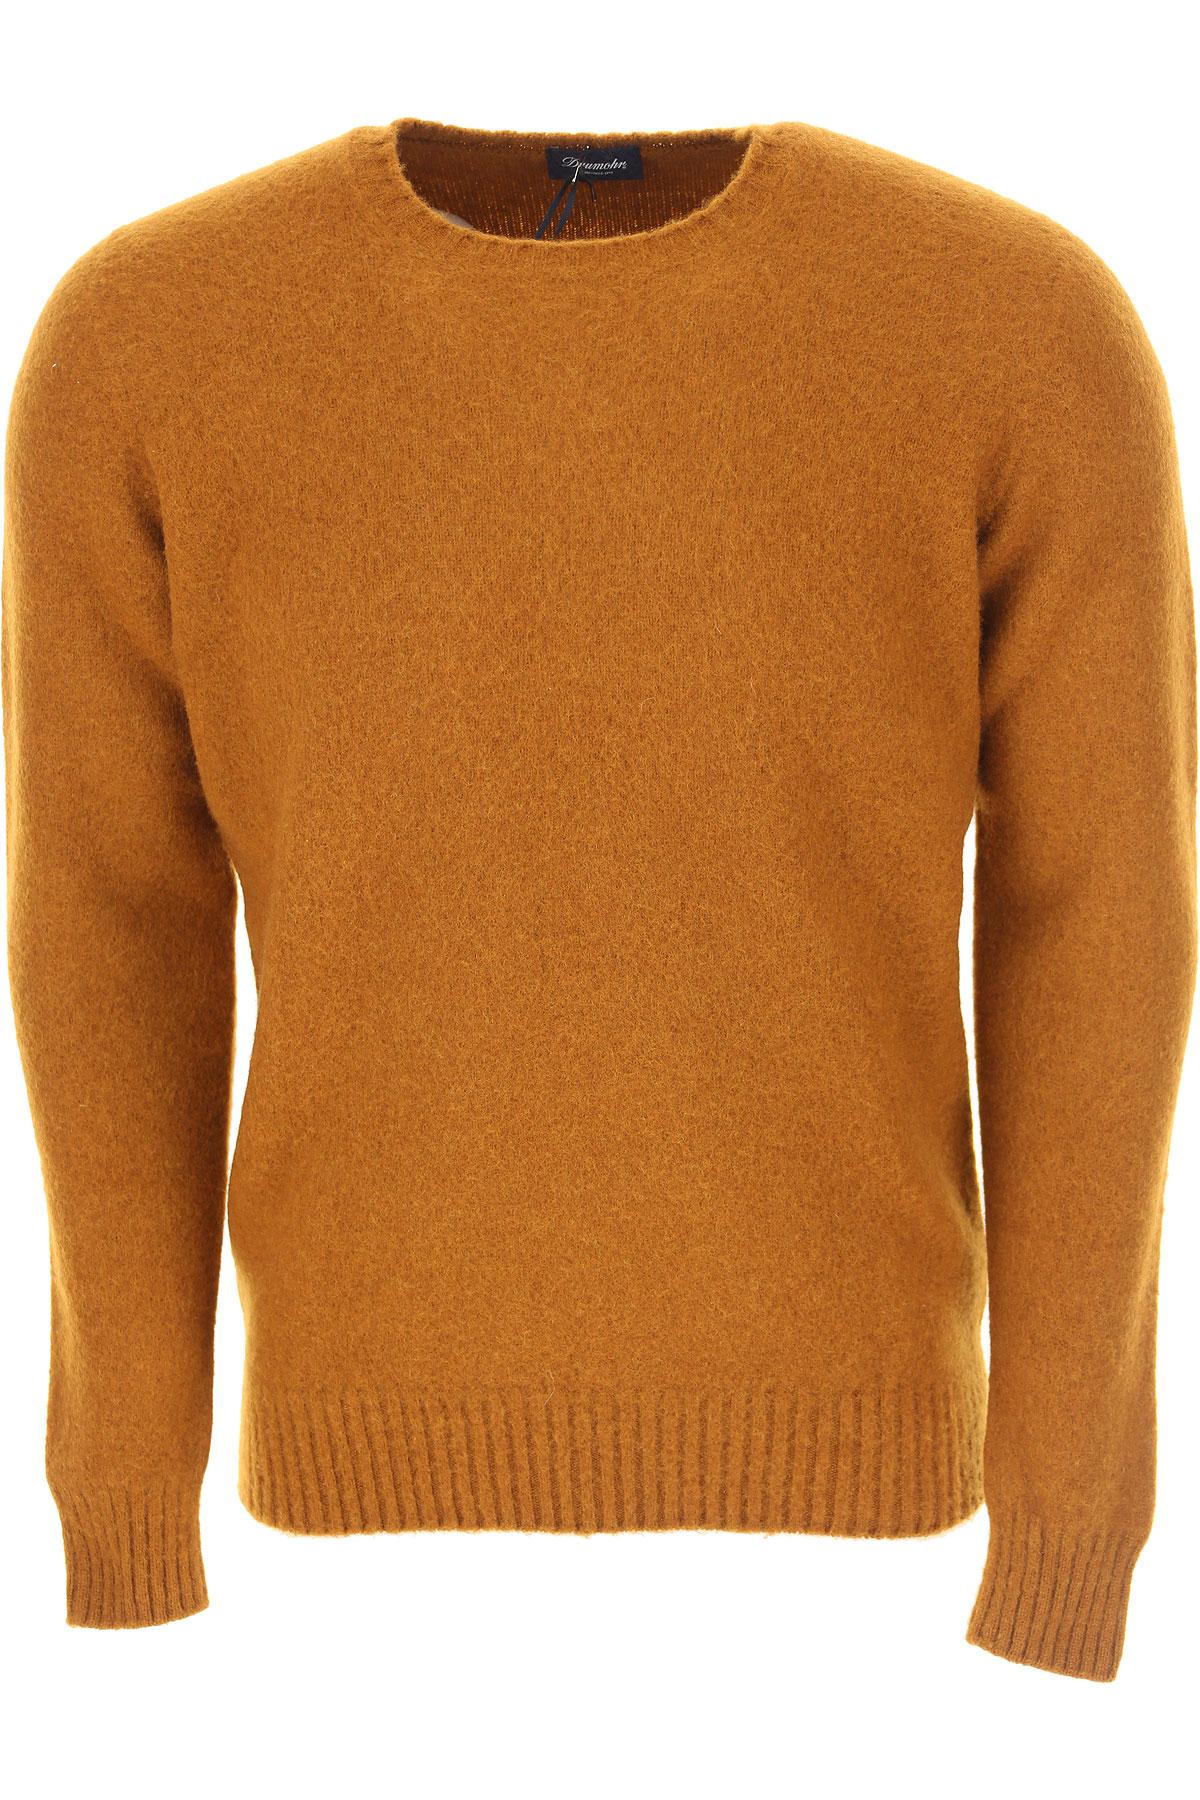 Image of Drumohr Sweater for Men Jumper, Biscuit, Wool, 2017, L M S XL